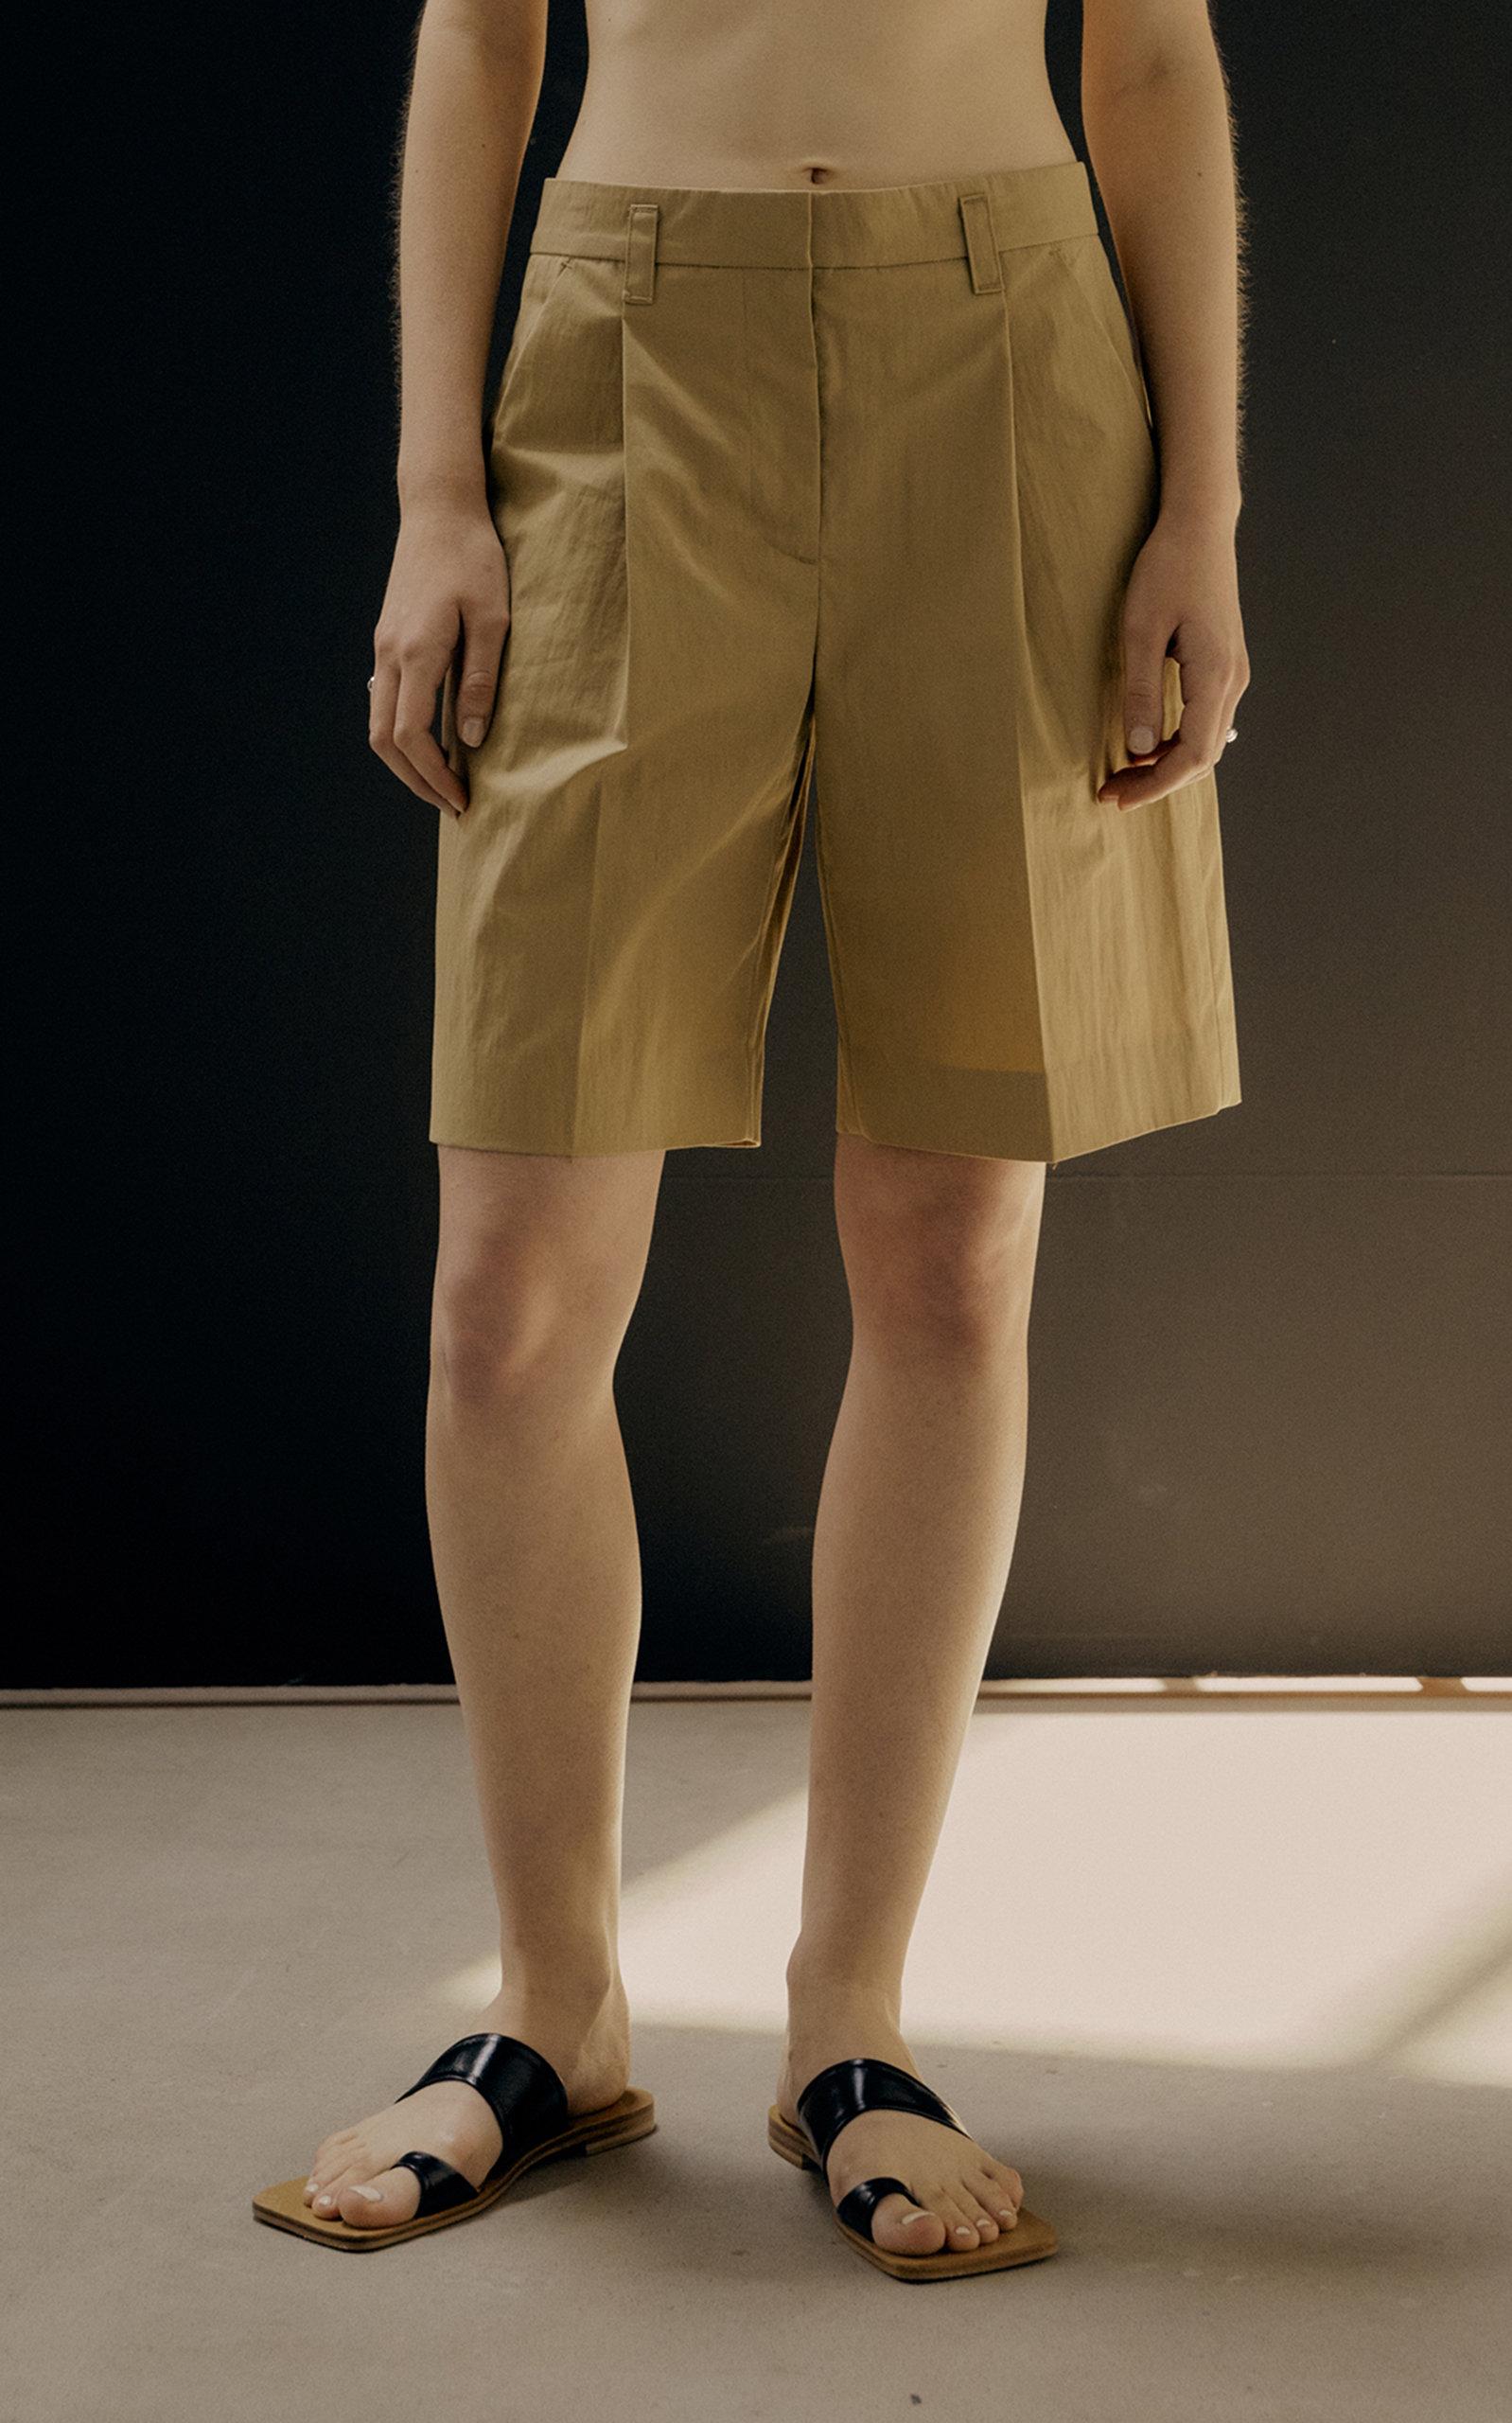 Low Classic WOMEN'S PLEATED COTTON-BLEND POPLIN SHORTS